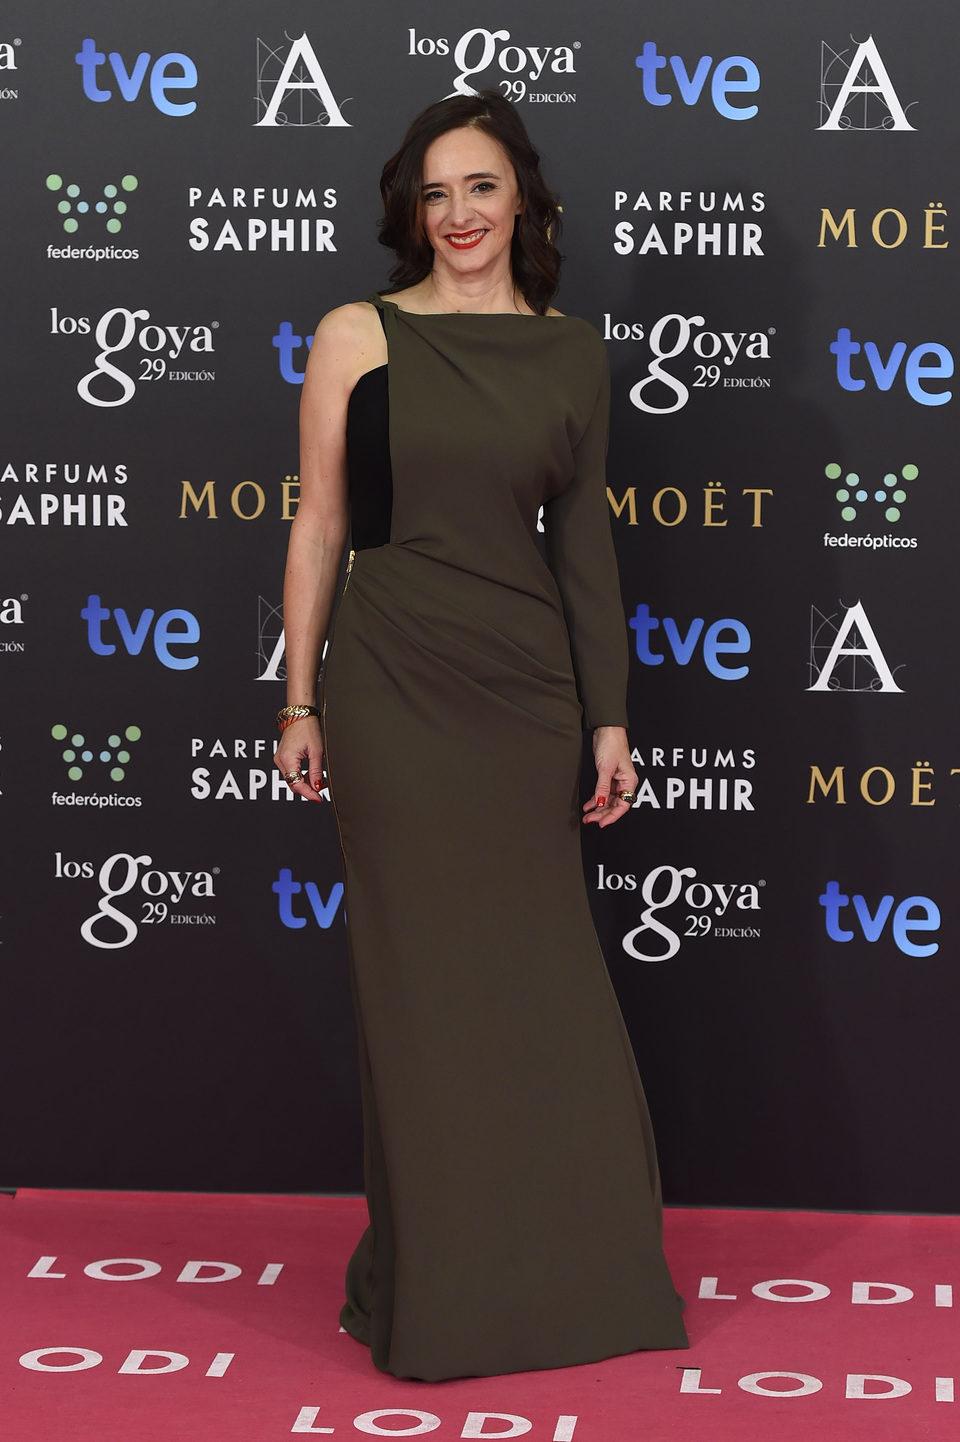 Ana Torrent en los Premios Goya 2015